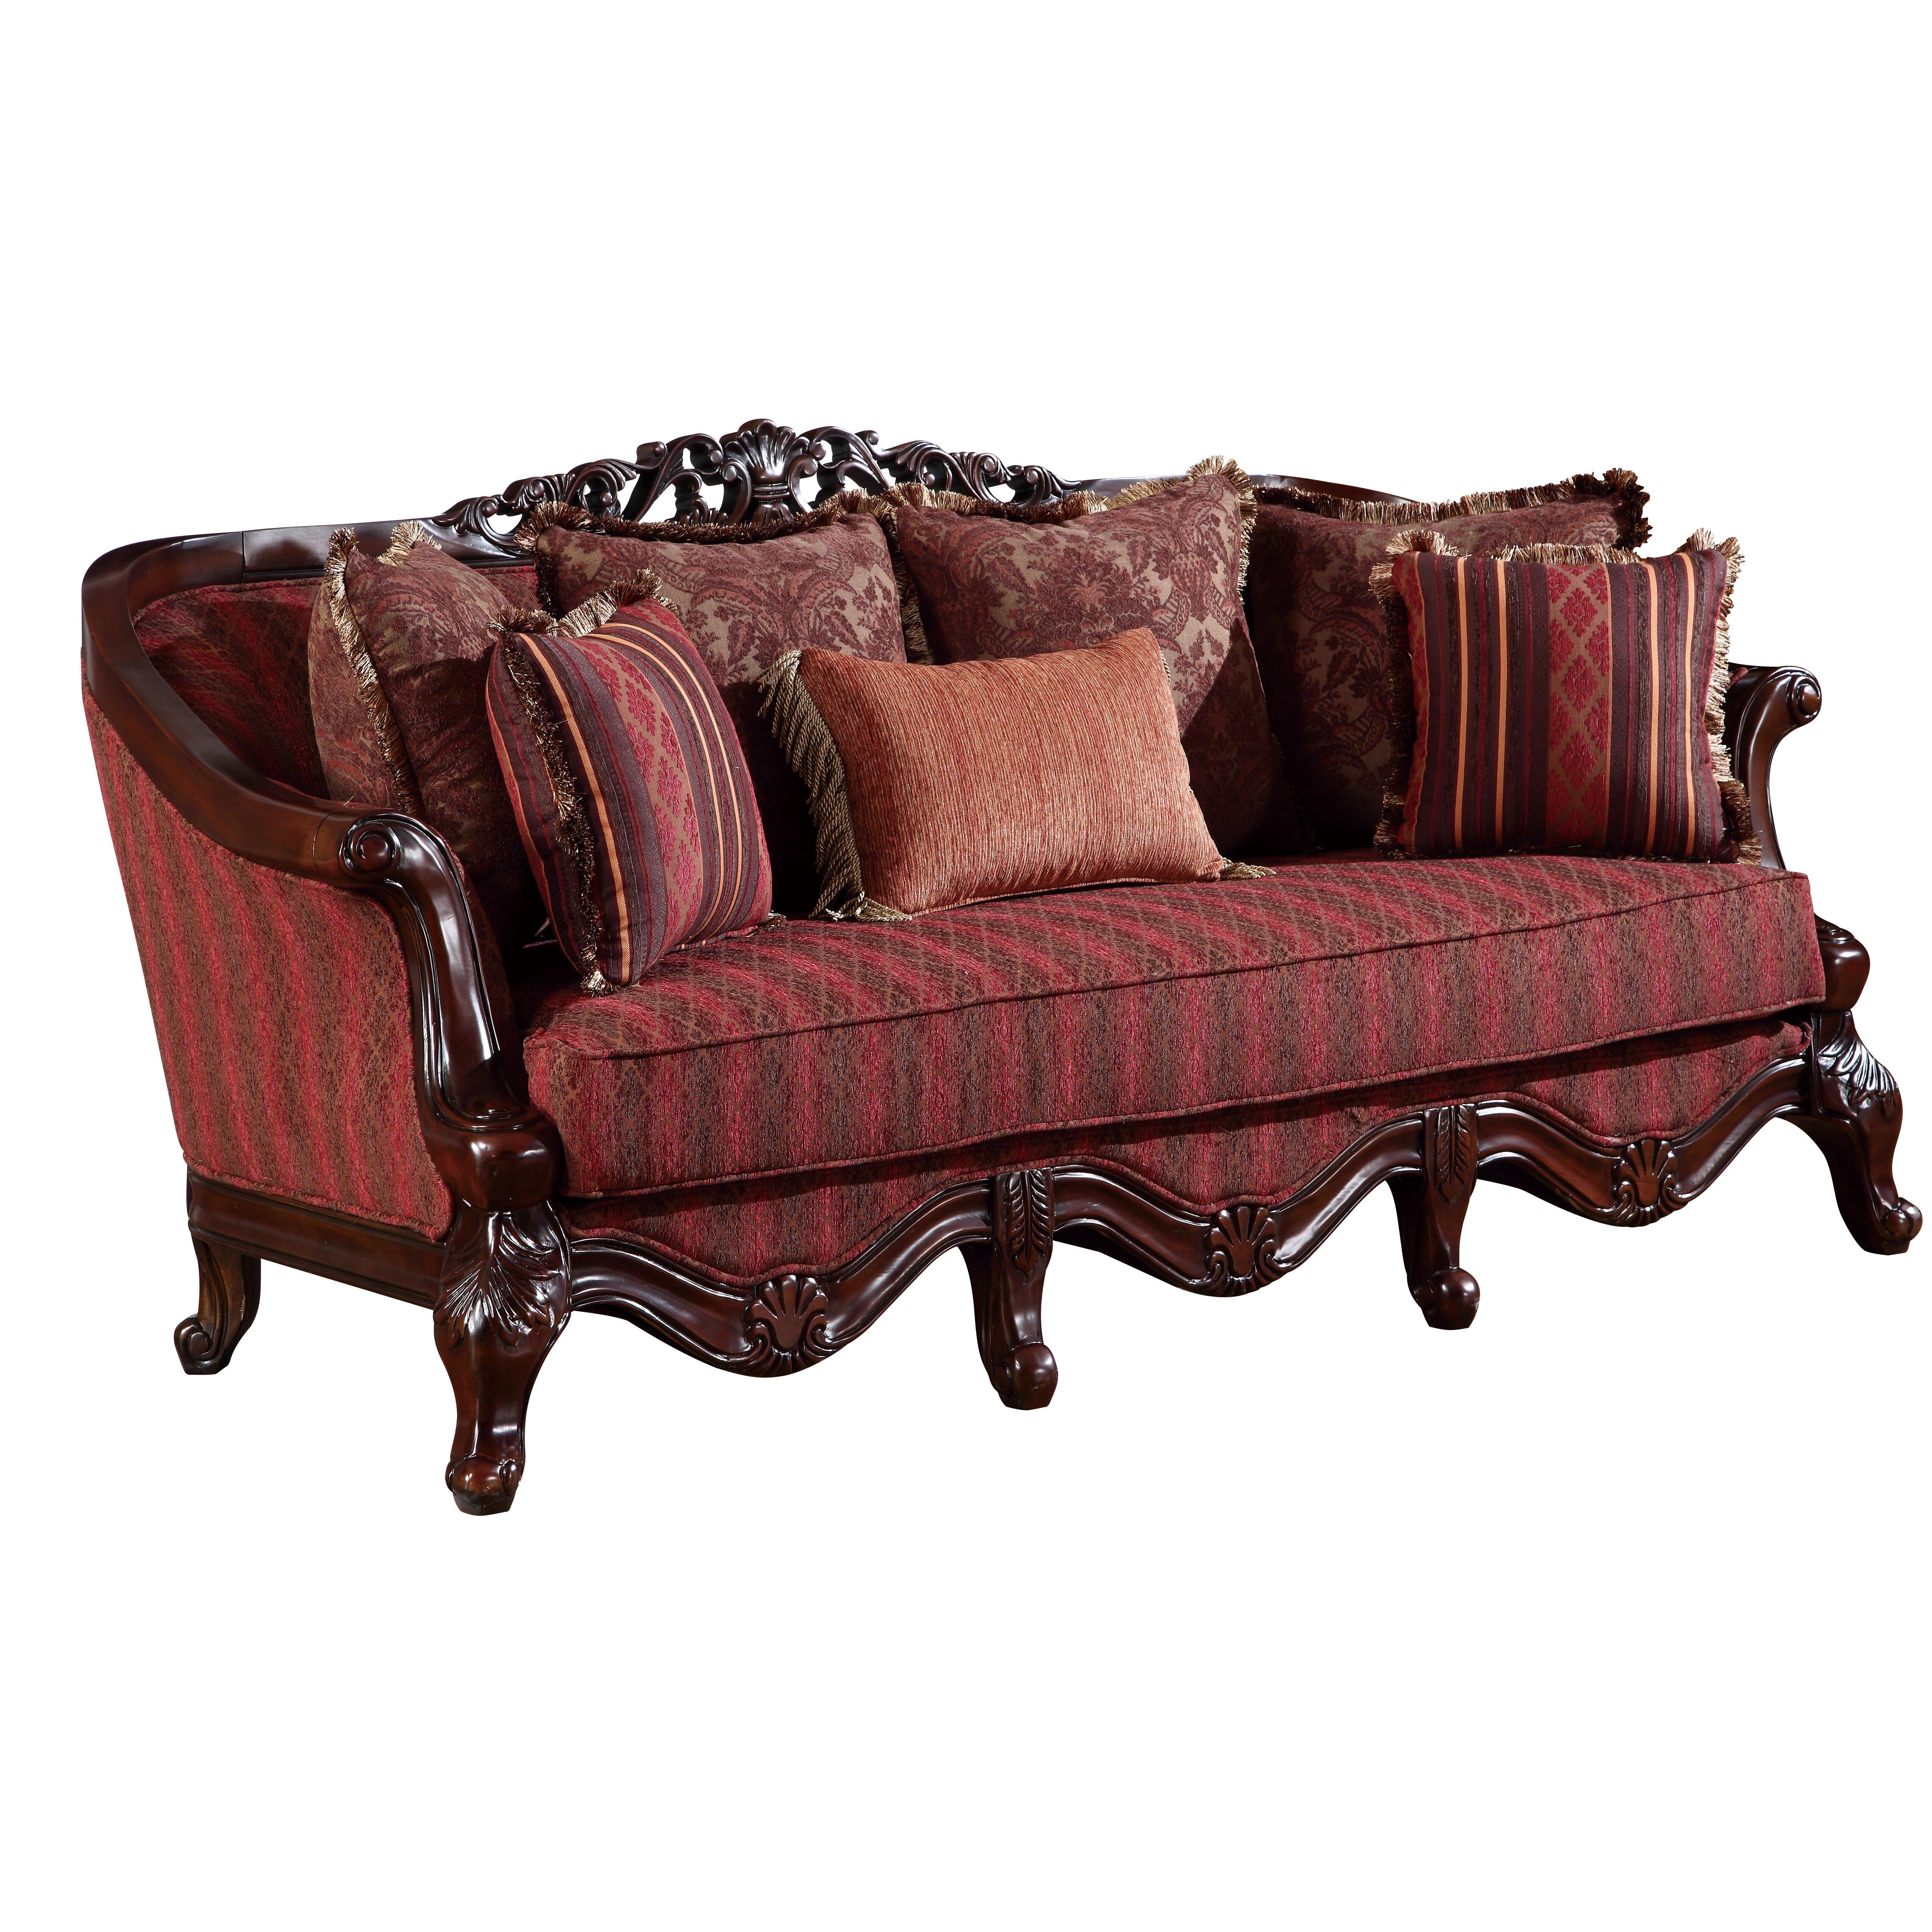 Global furniture usa sofa reviews wayfair for Furniture usa